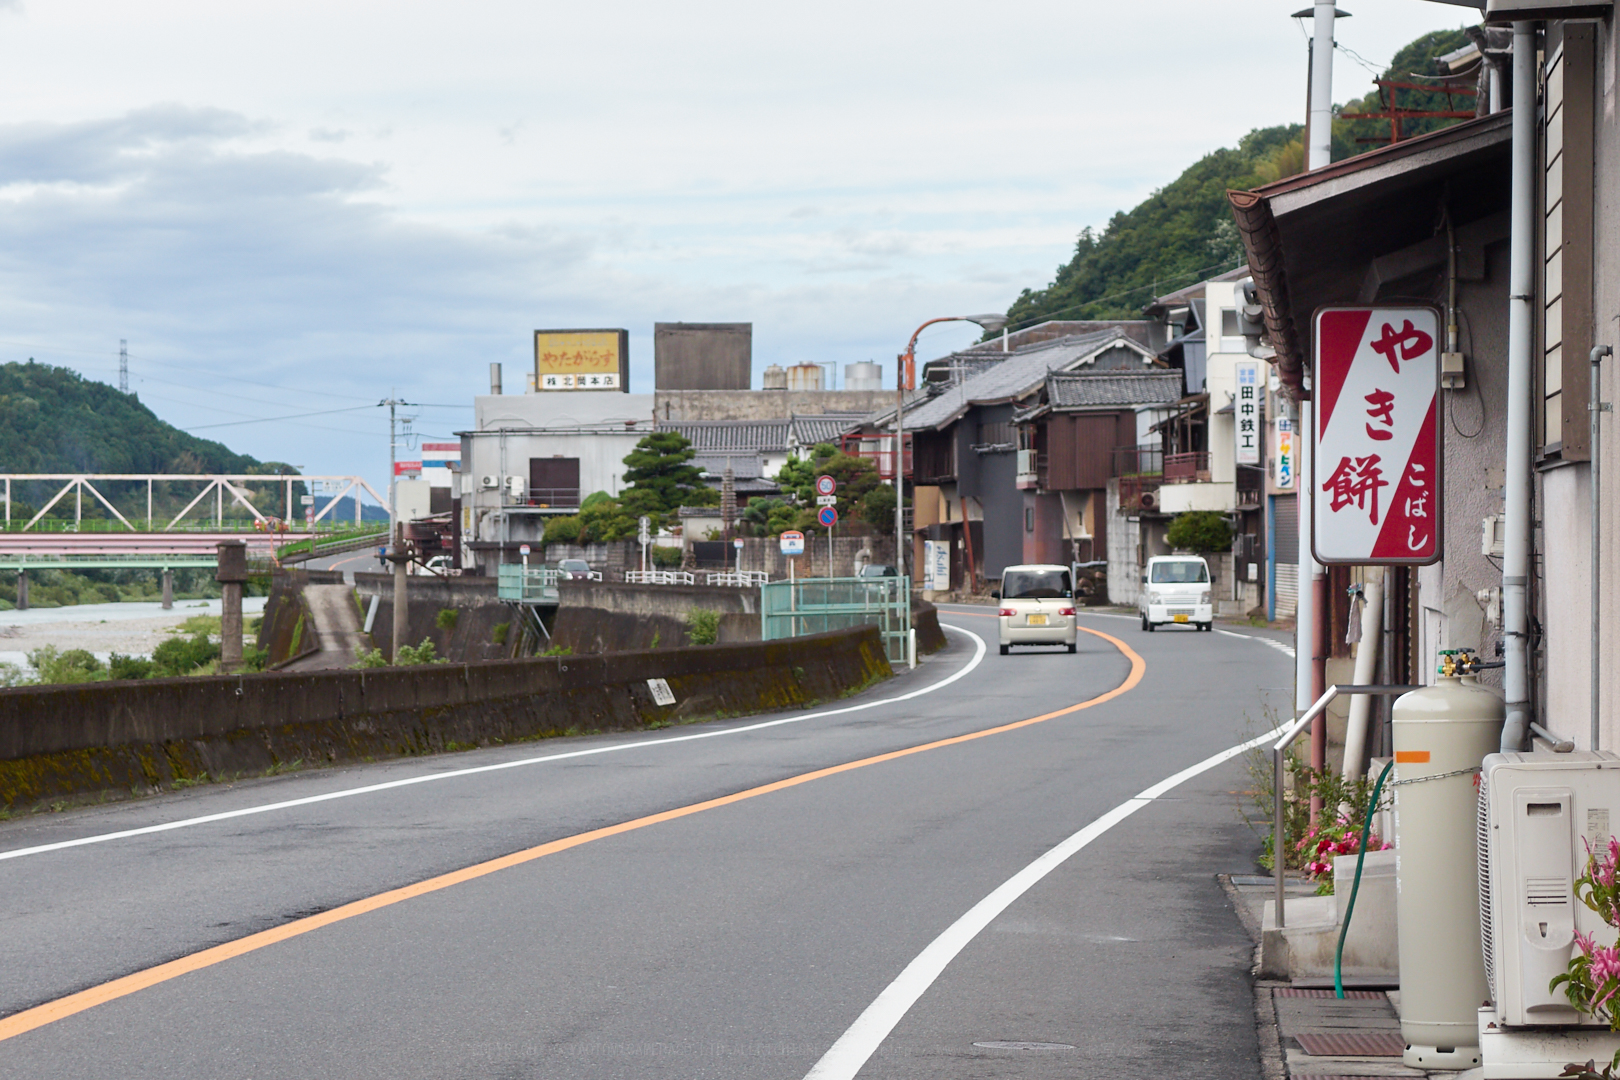 https://www.yaotomi.co.jp/blog/walk/PXZ20998%2C24%20mm%2CF3.5%2Ciso100.jpg